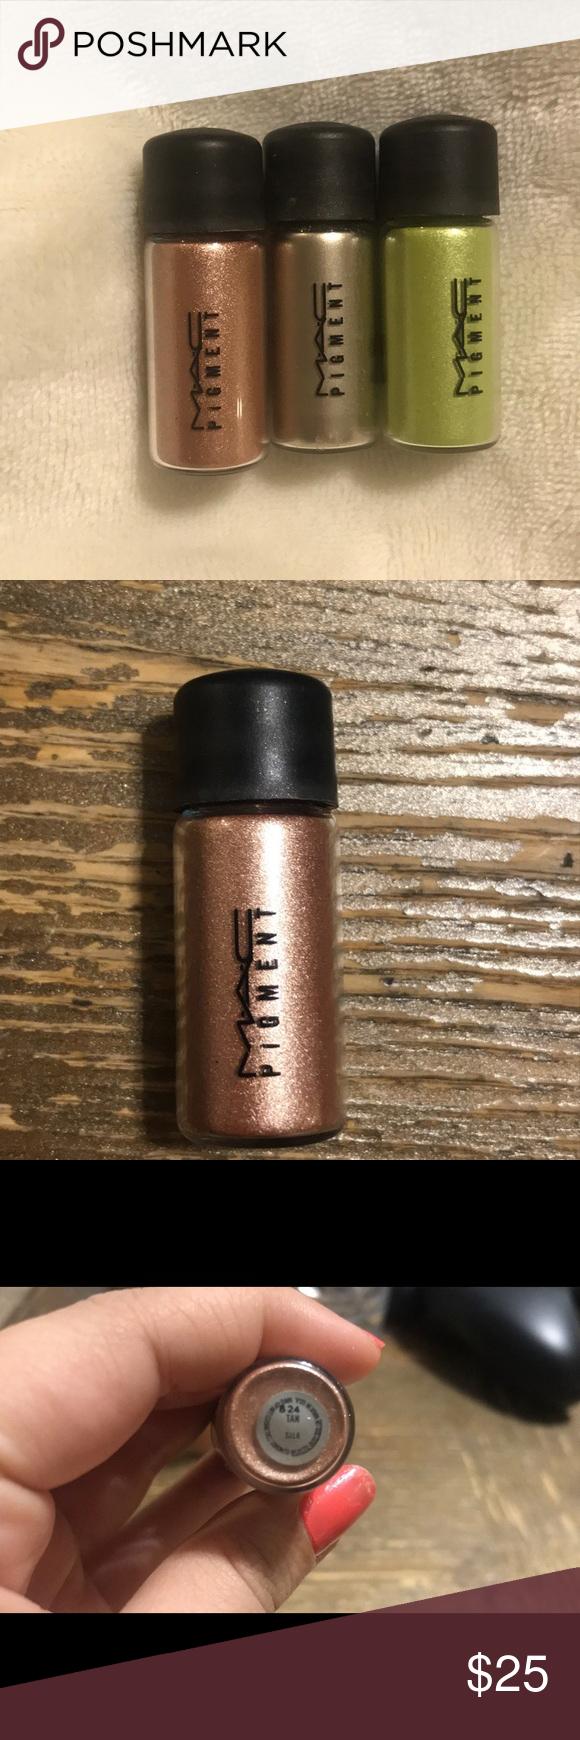 Mac mini pigment in Chartreuse, Platinum, and Tan. Brand